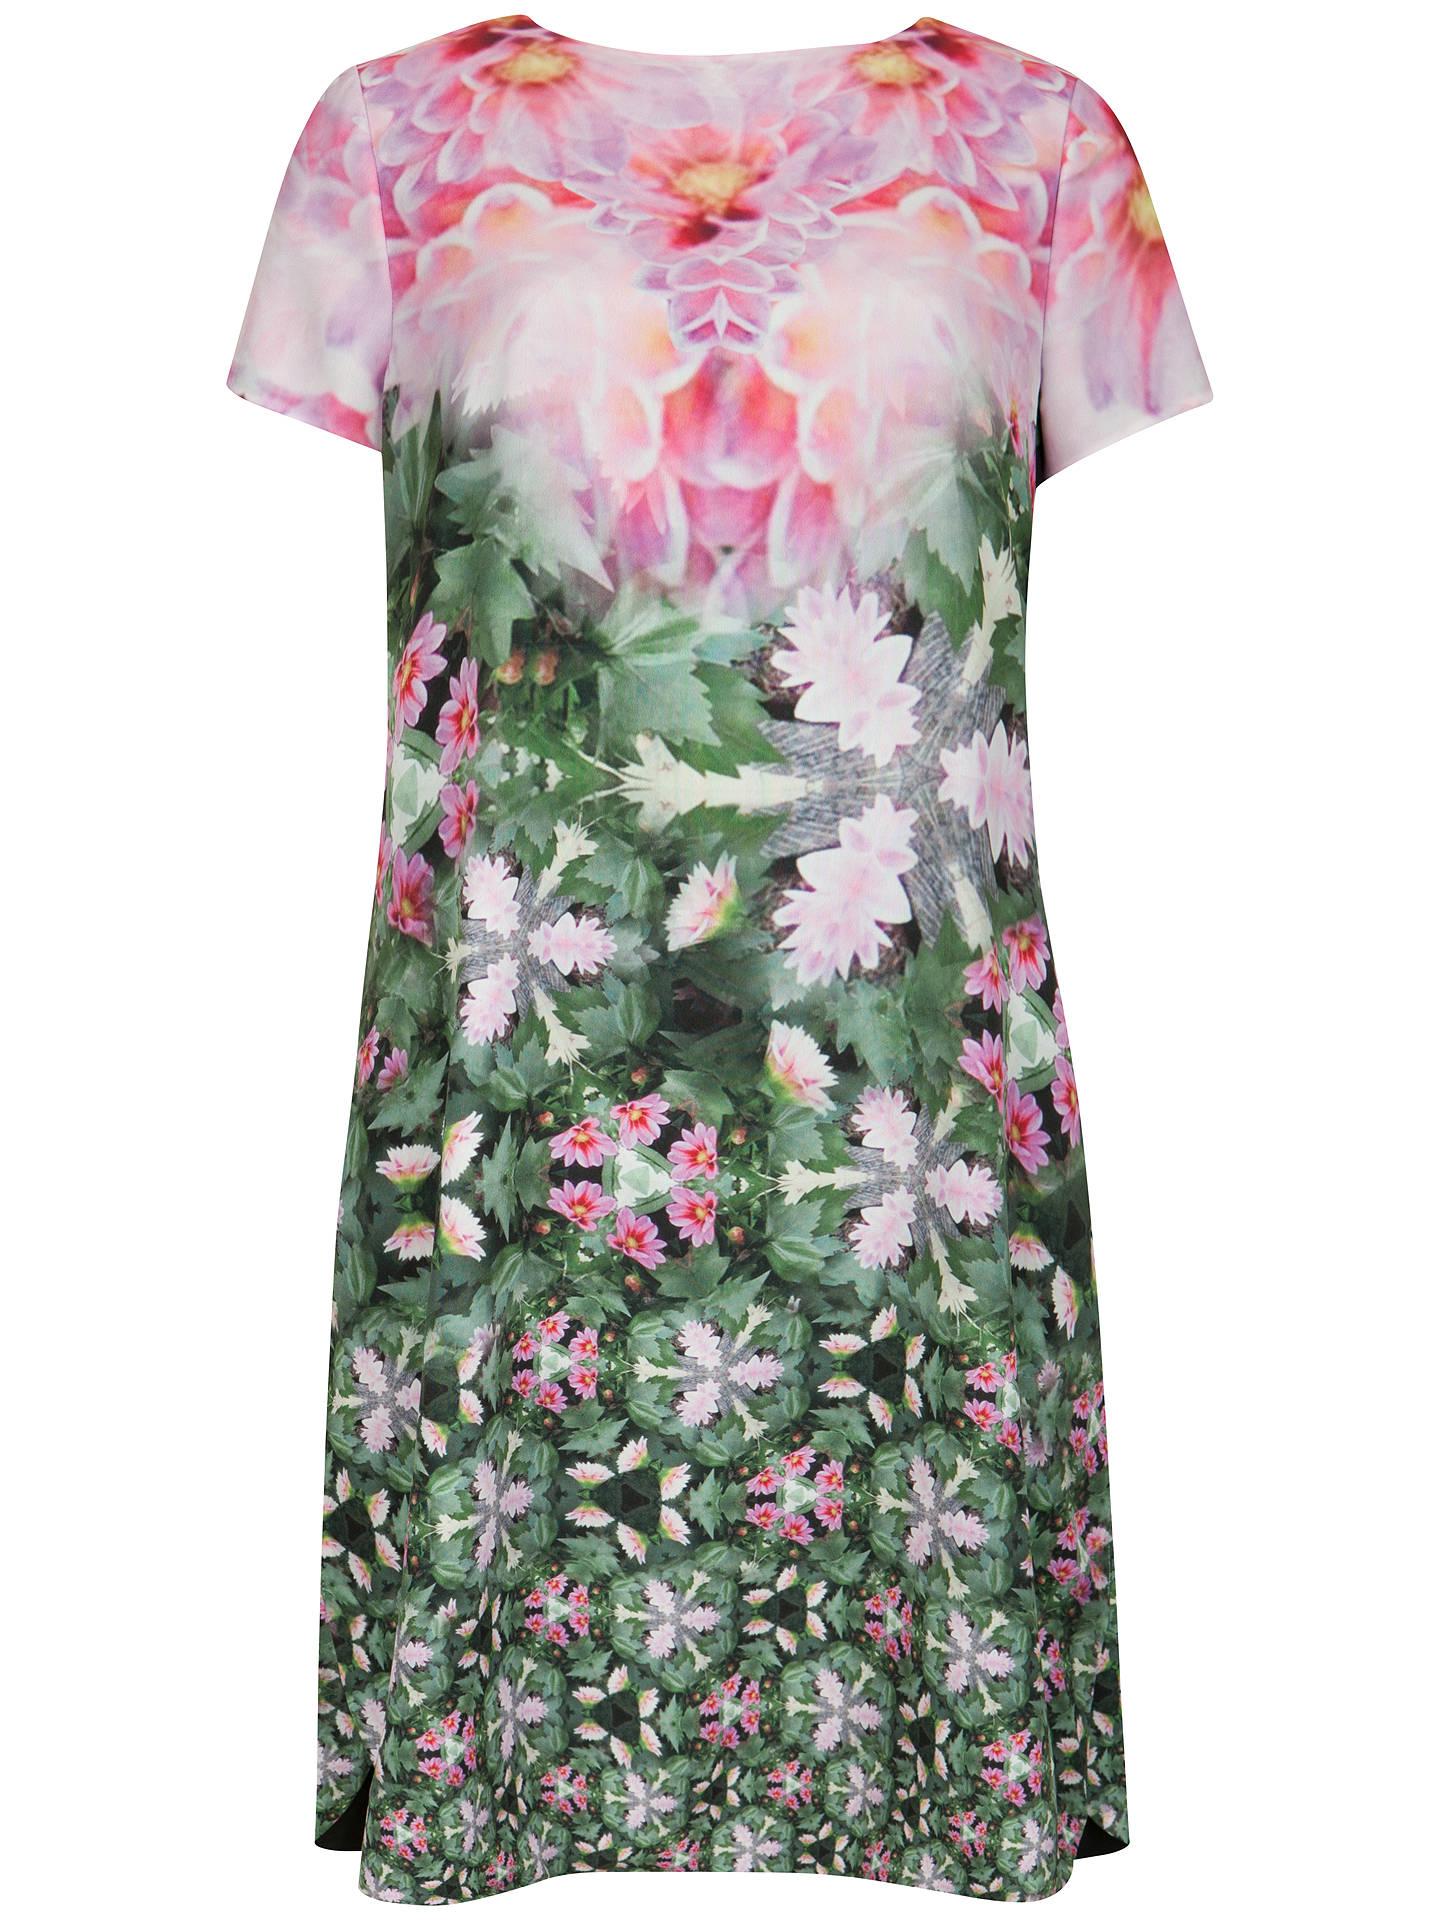 32ff3d7a47d Buy Ted Baker Natural Kingdom Tunic Dress, Multi, 6 Online at johnlewis.com